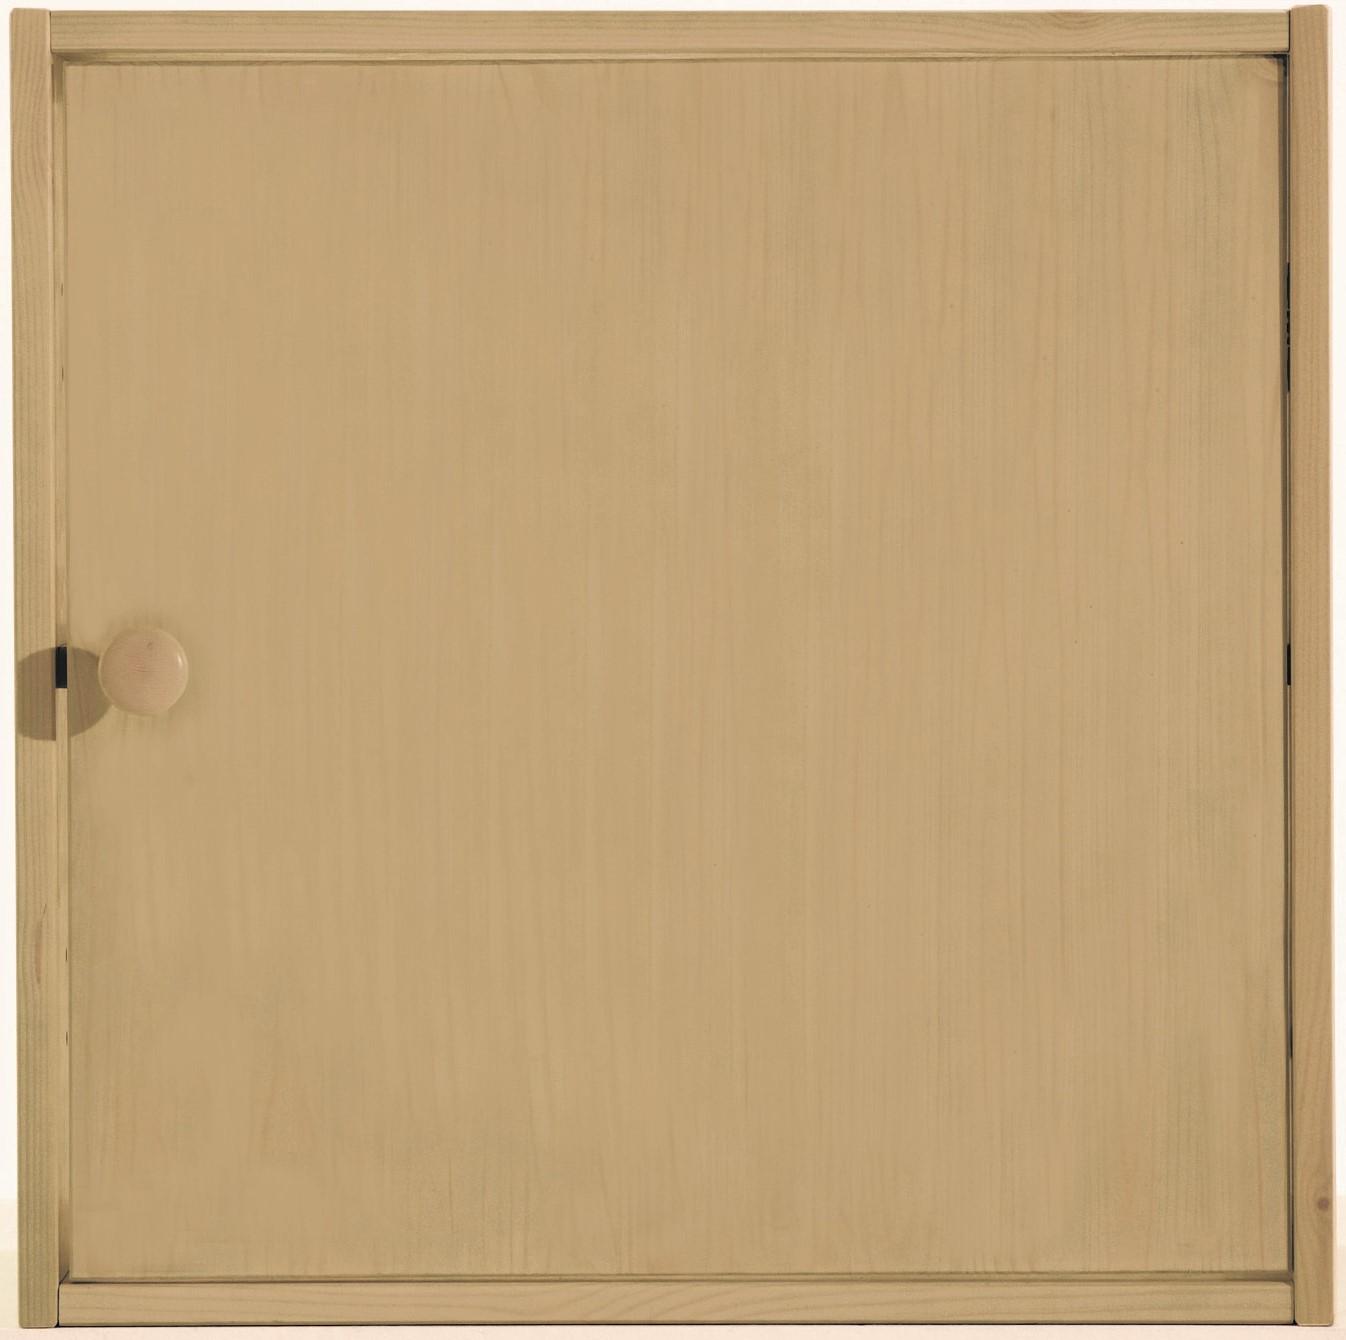 Tür groß Kiefer massiv 46,4 x 46,4 x 1,6 cm